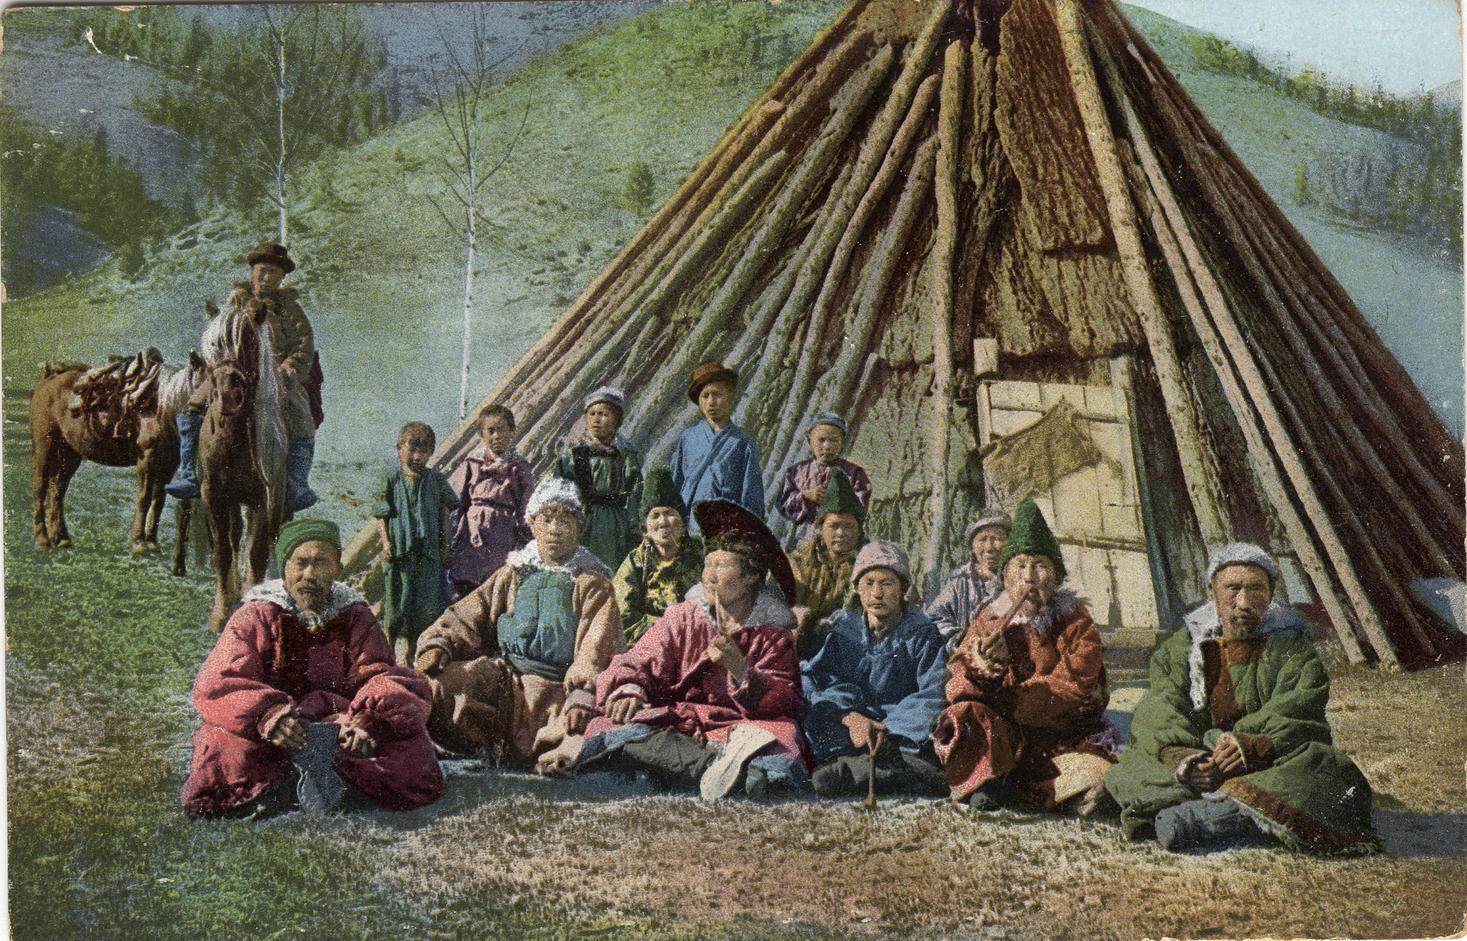 Группа алтайцев у жилища (чаадыр). Долина Катуни